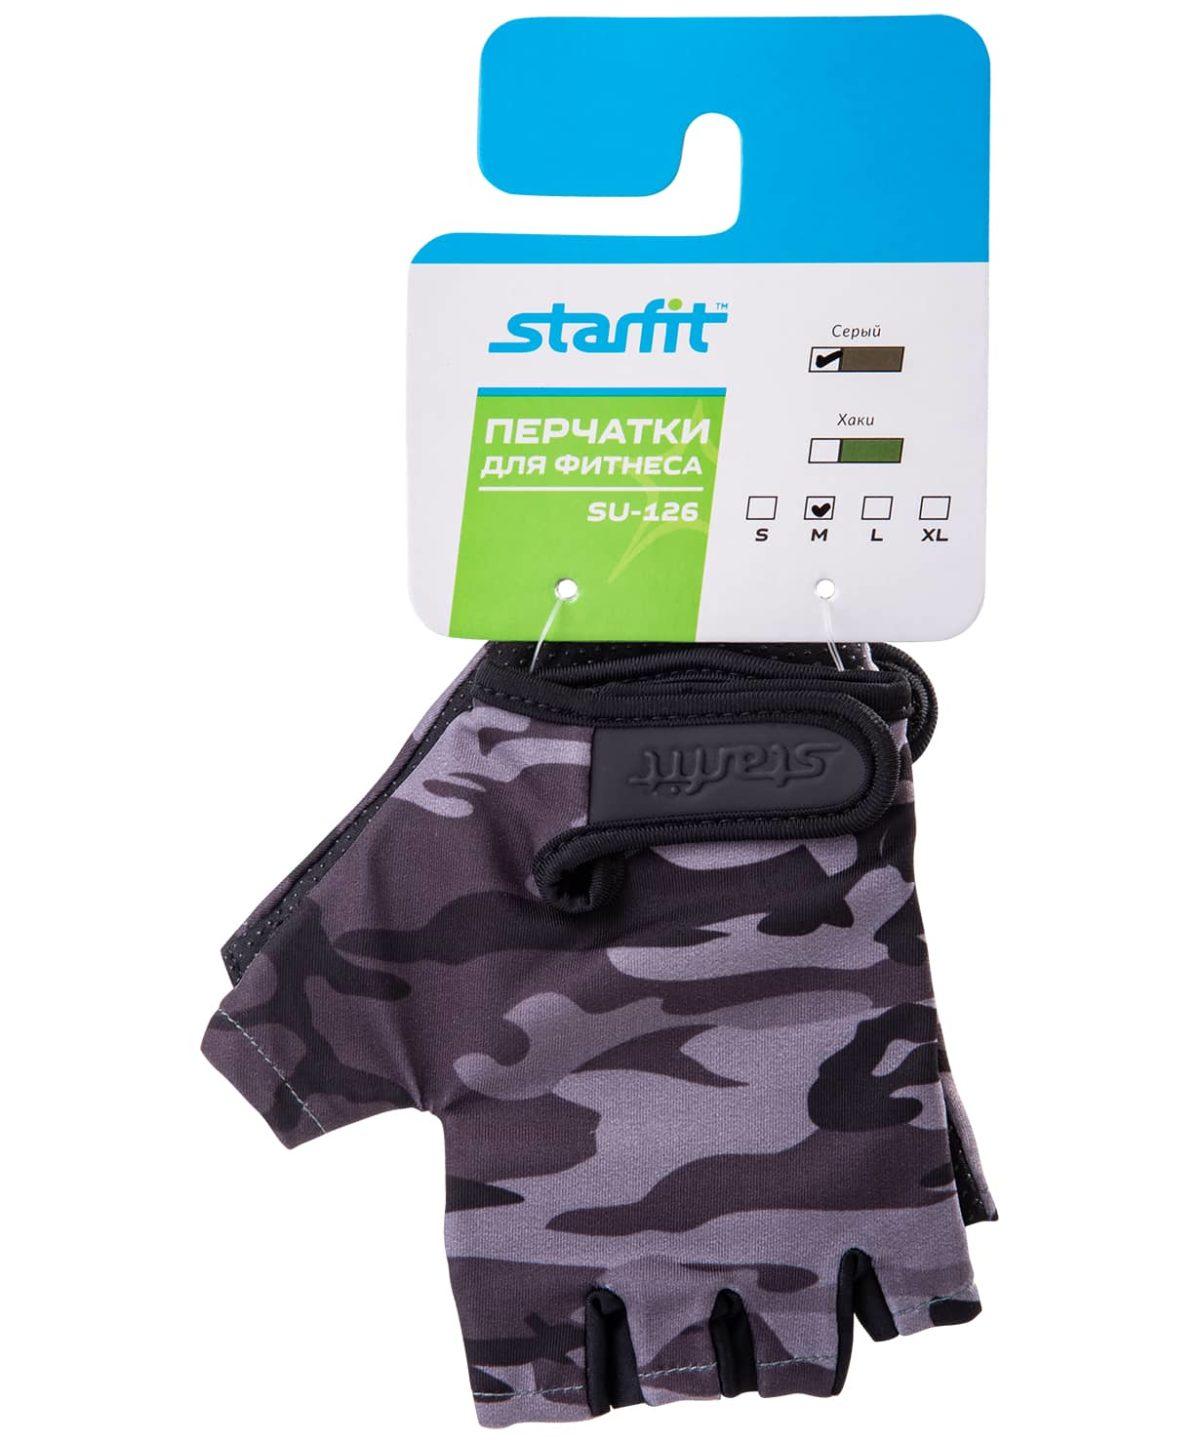 STARFIT перчатки д/фитнеса  SU-126: серый - 5